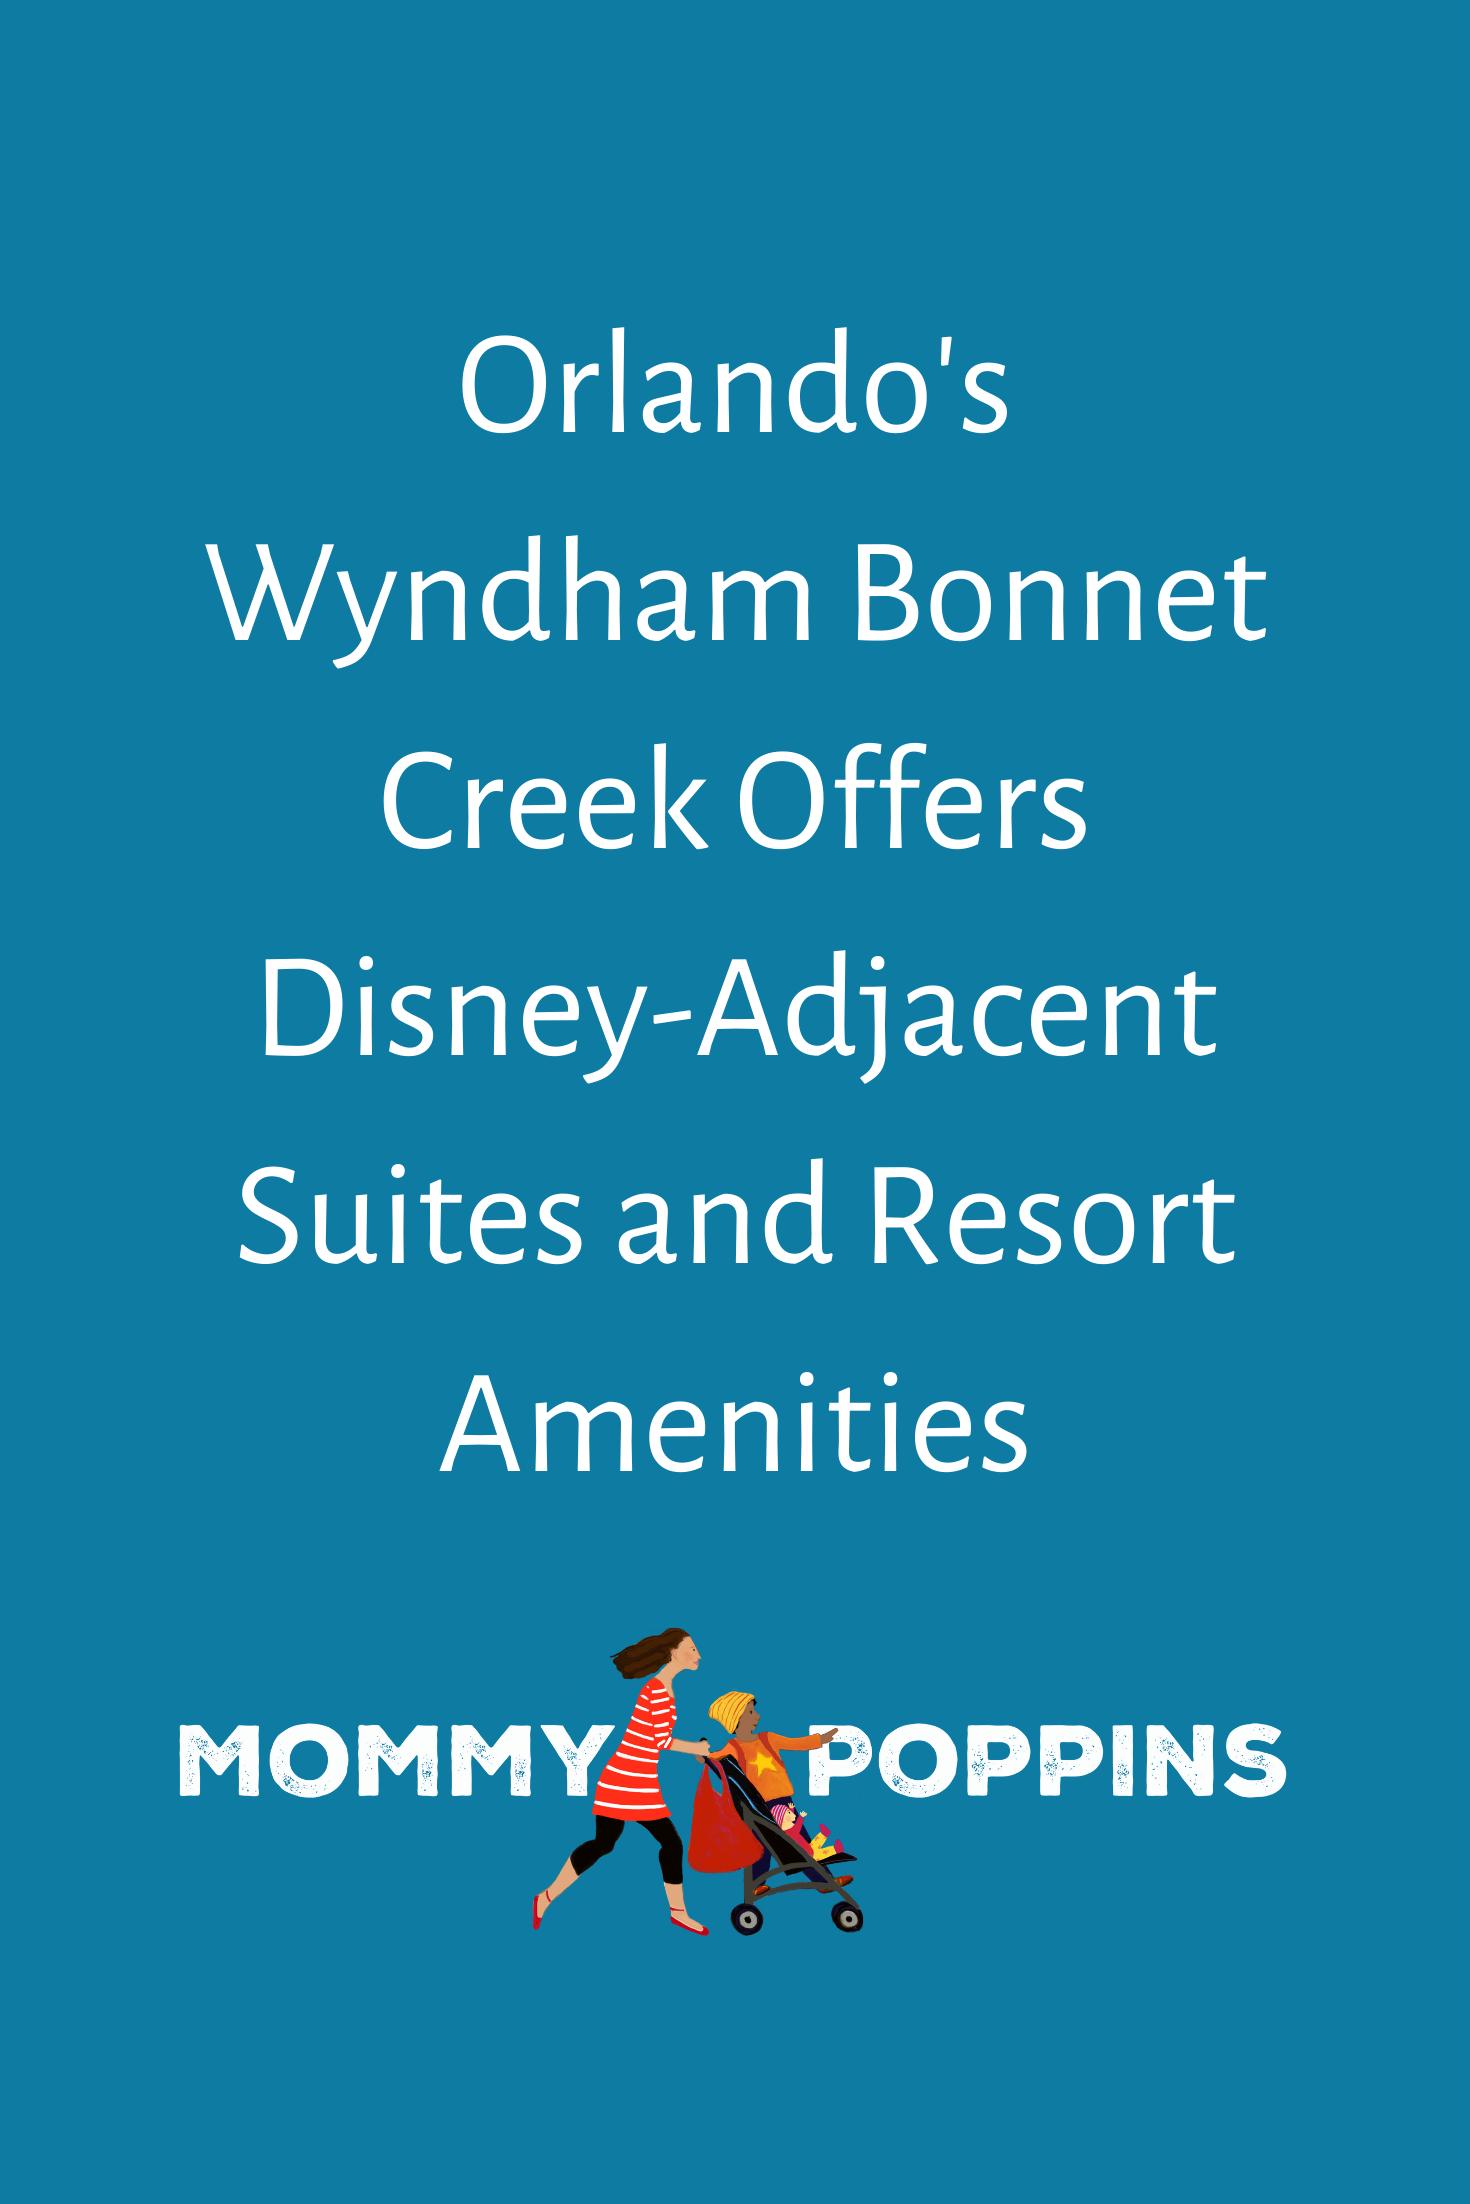 Orlando's Wyndham Creek Offers DisneyAdjacent